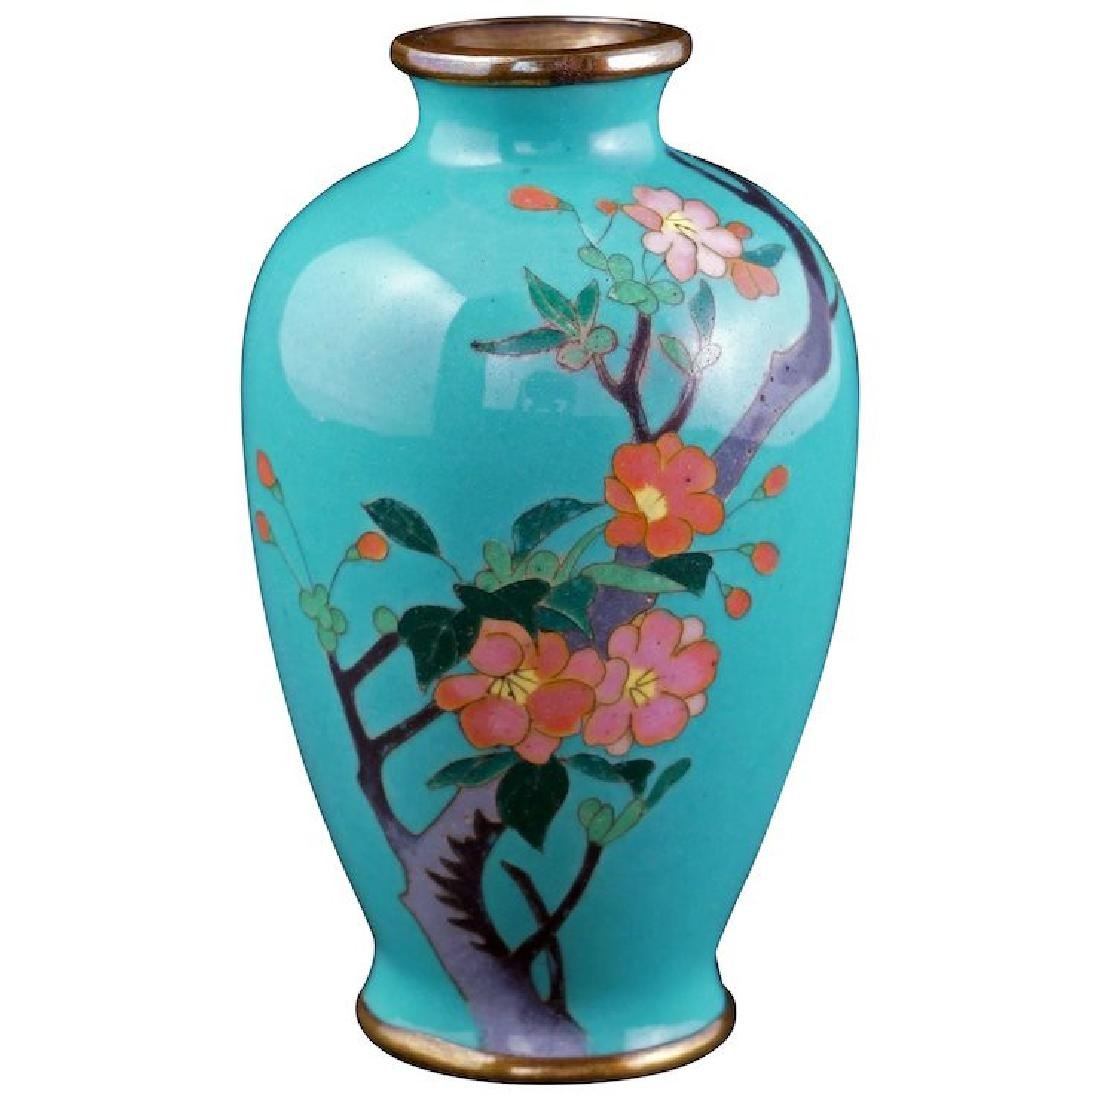 Japanese miniature cloisonné vase with cherry blossoms